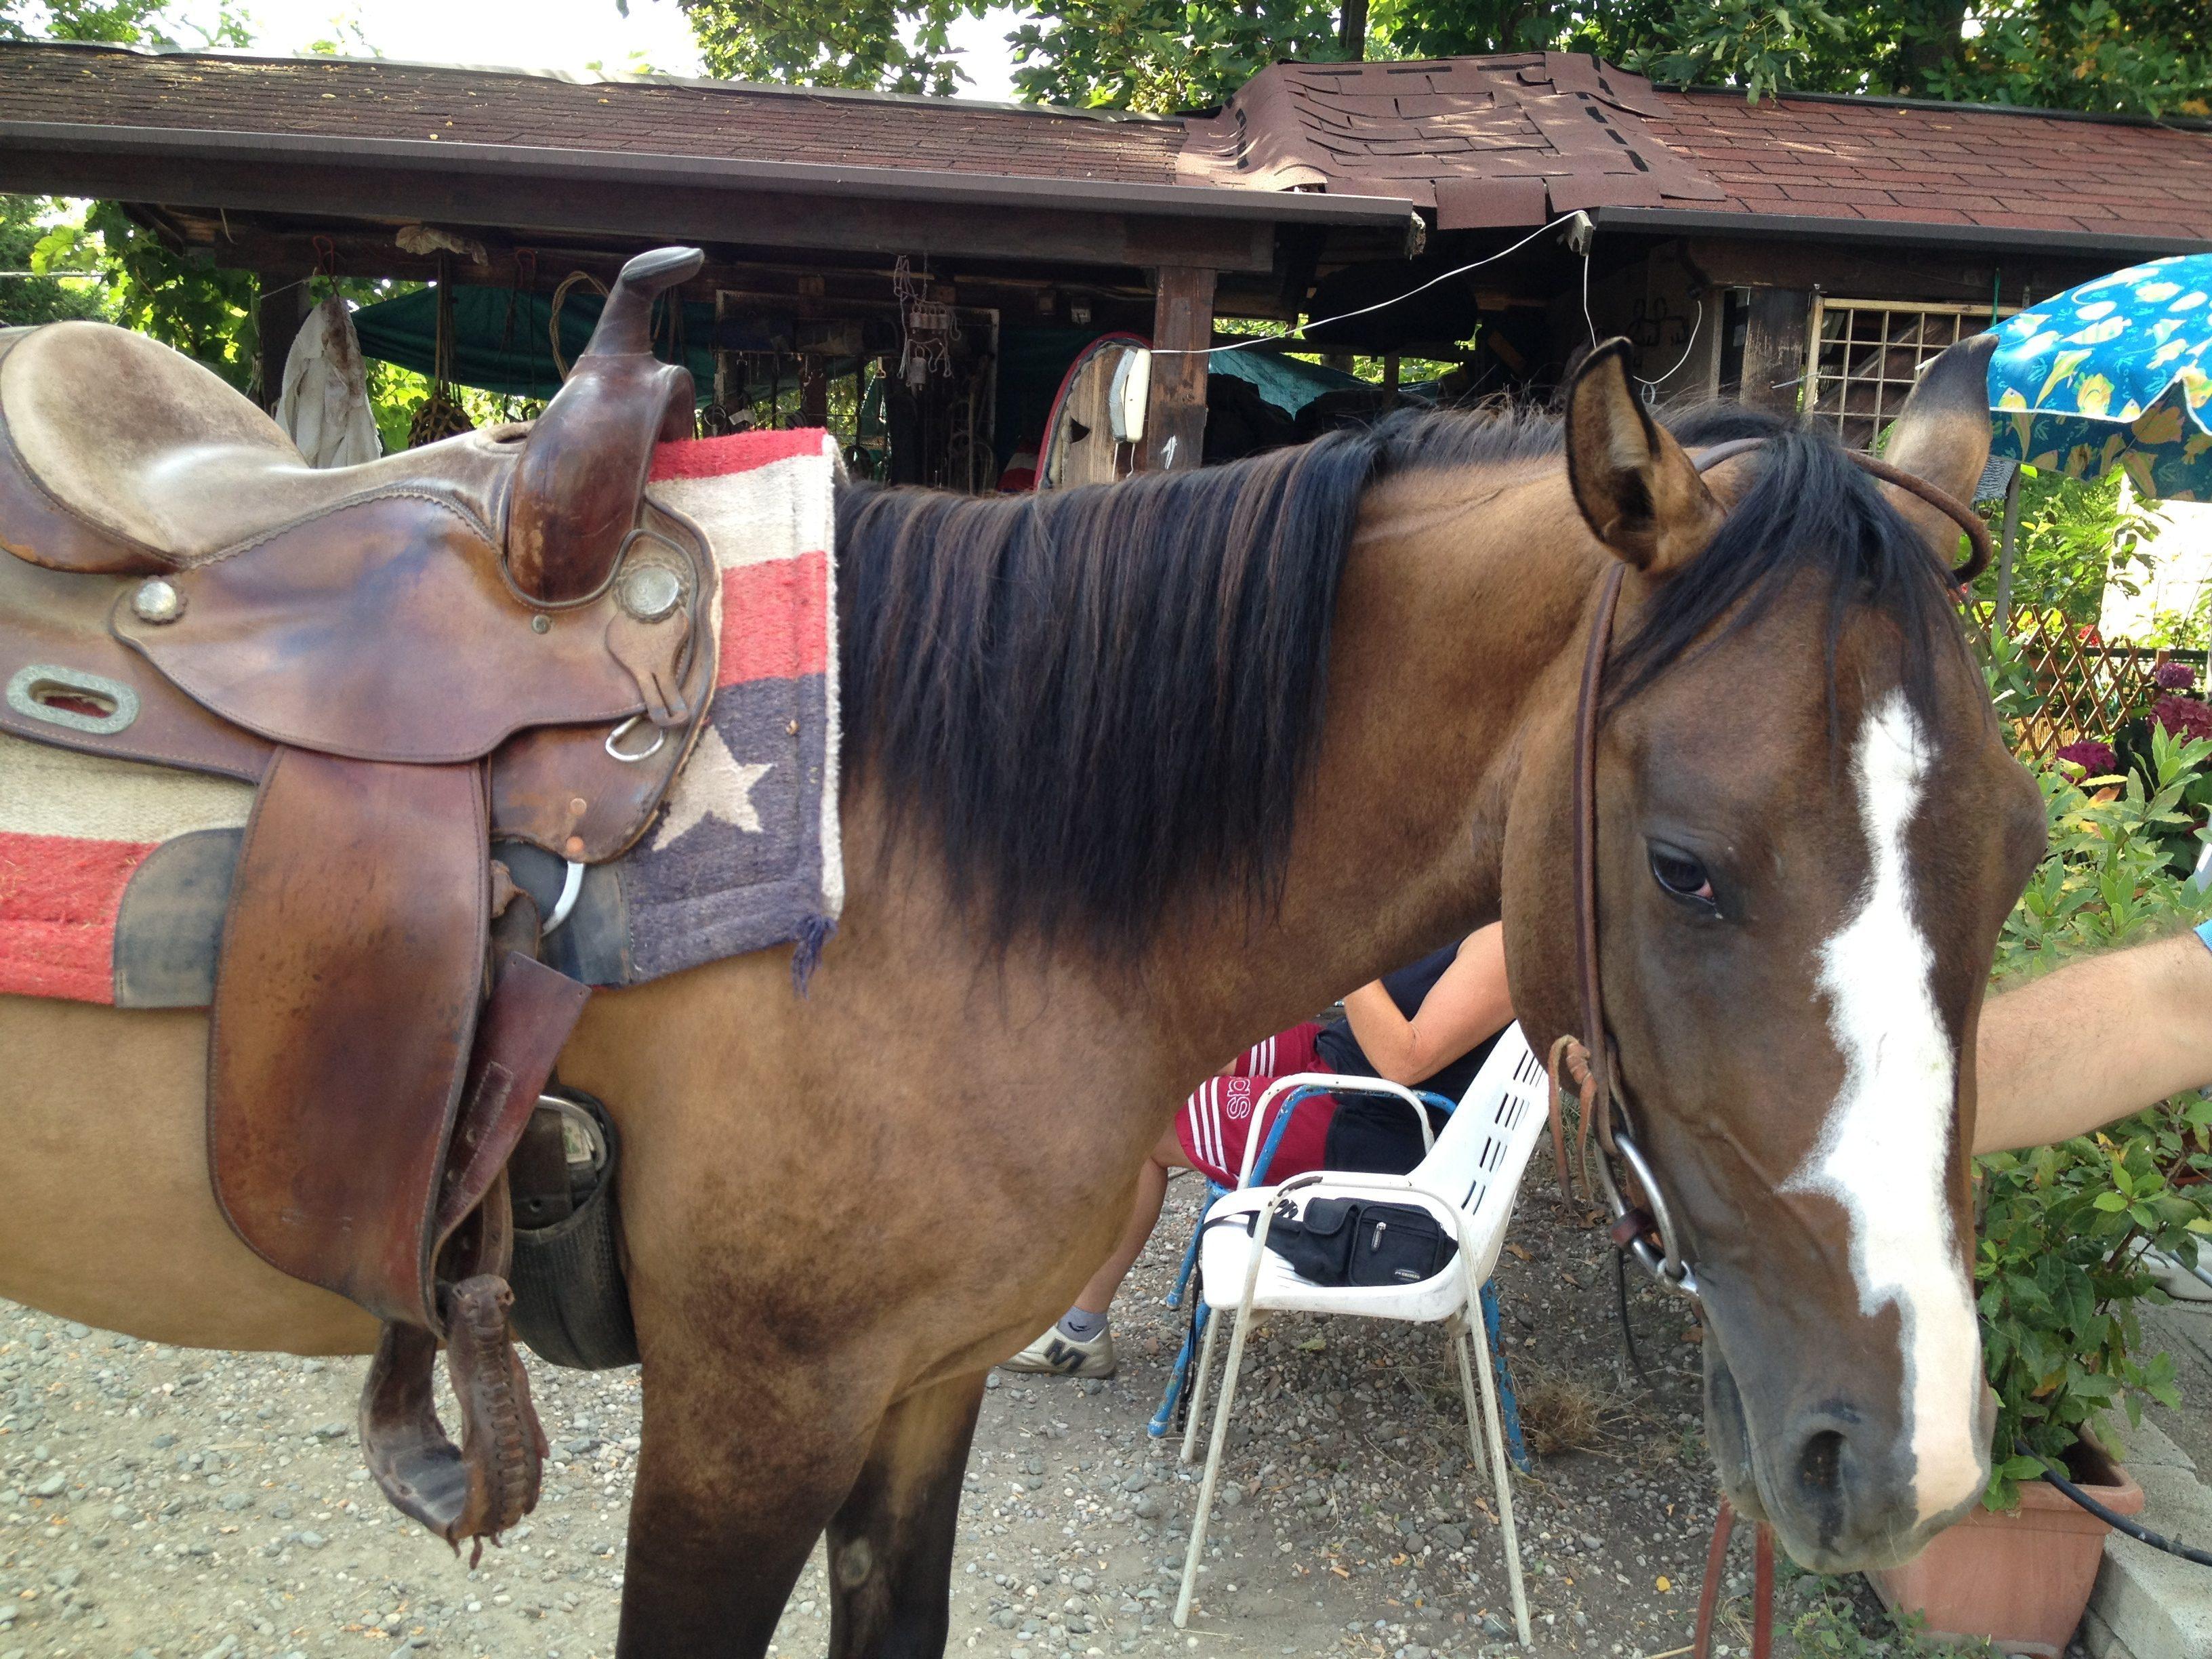 Un sabato a cavallo con smartbox e vapederm federica - Avere un cavallo ...